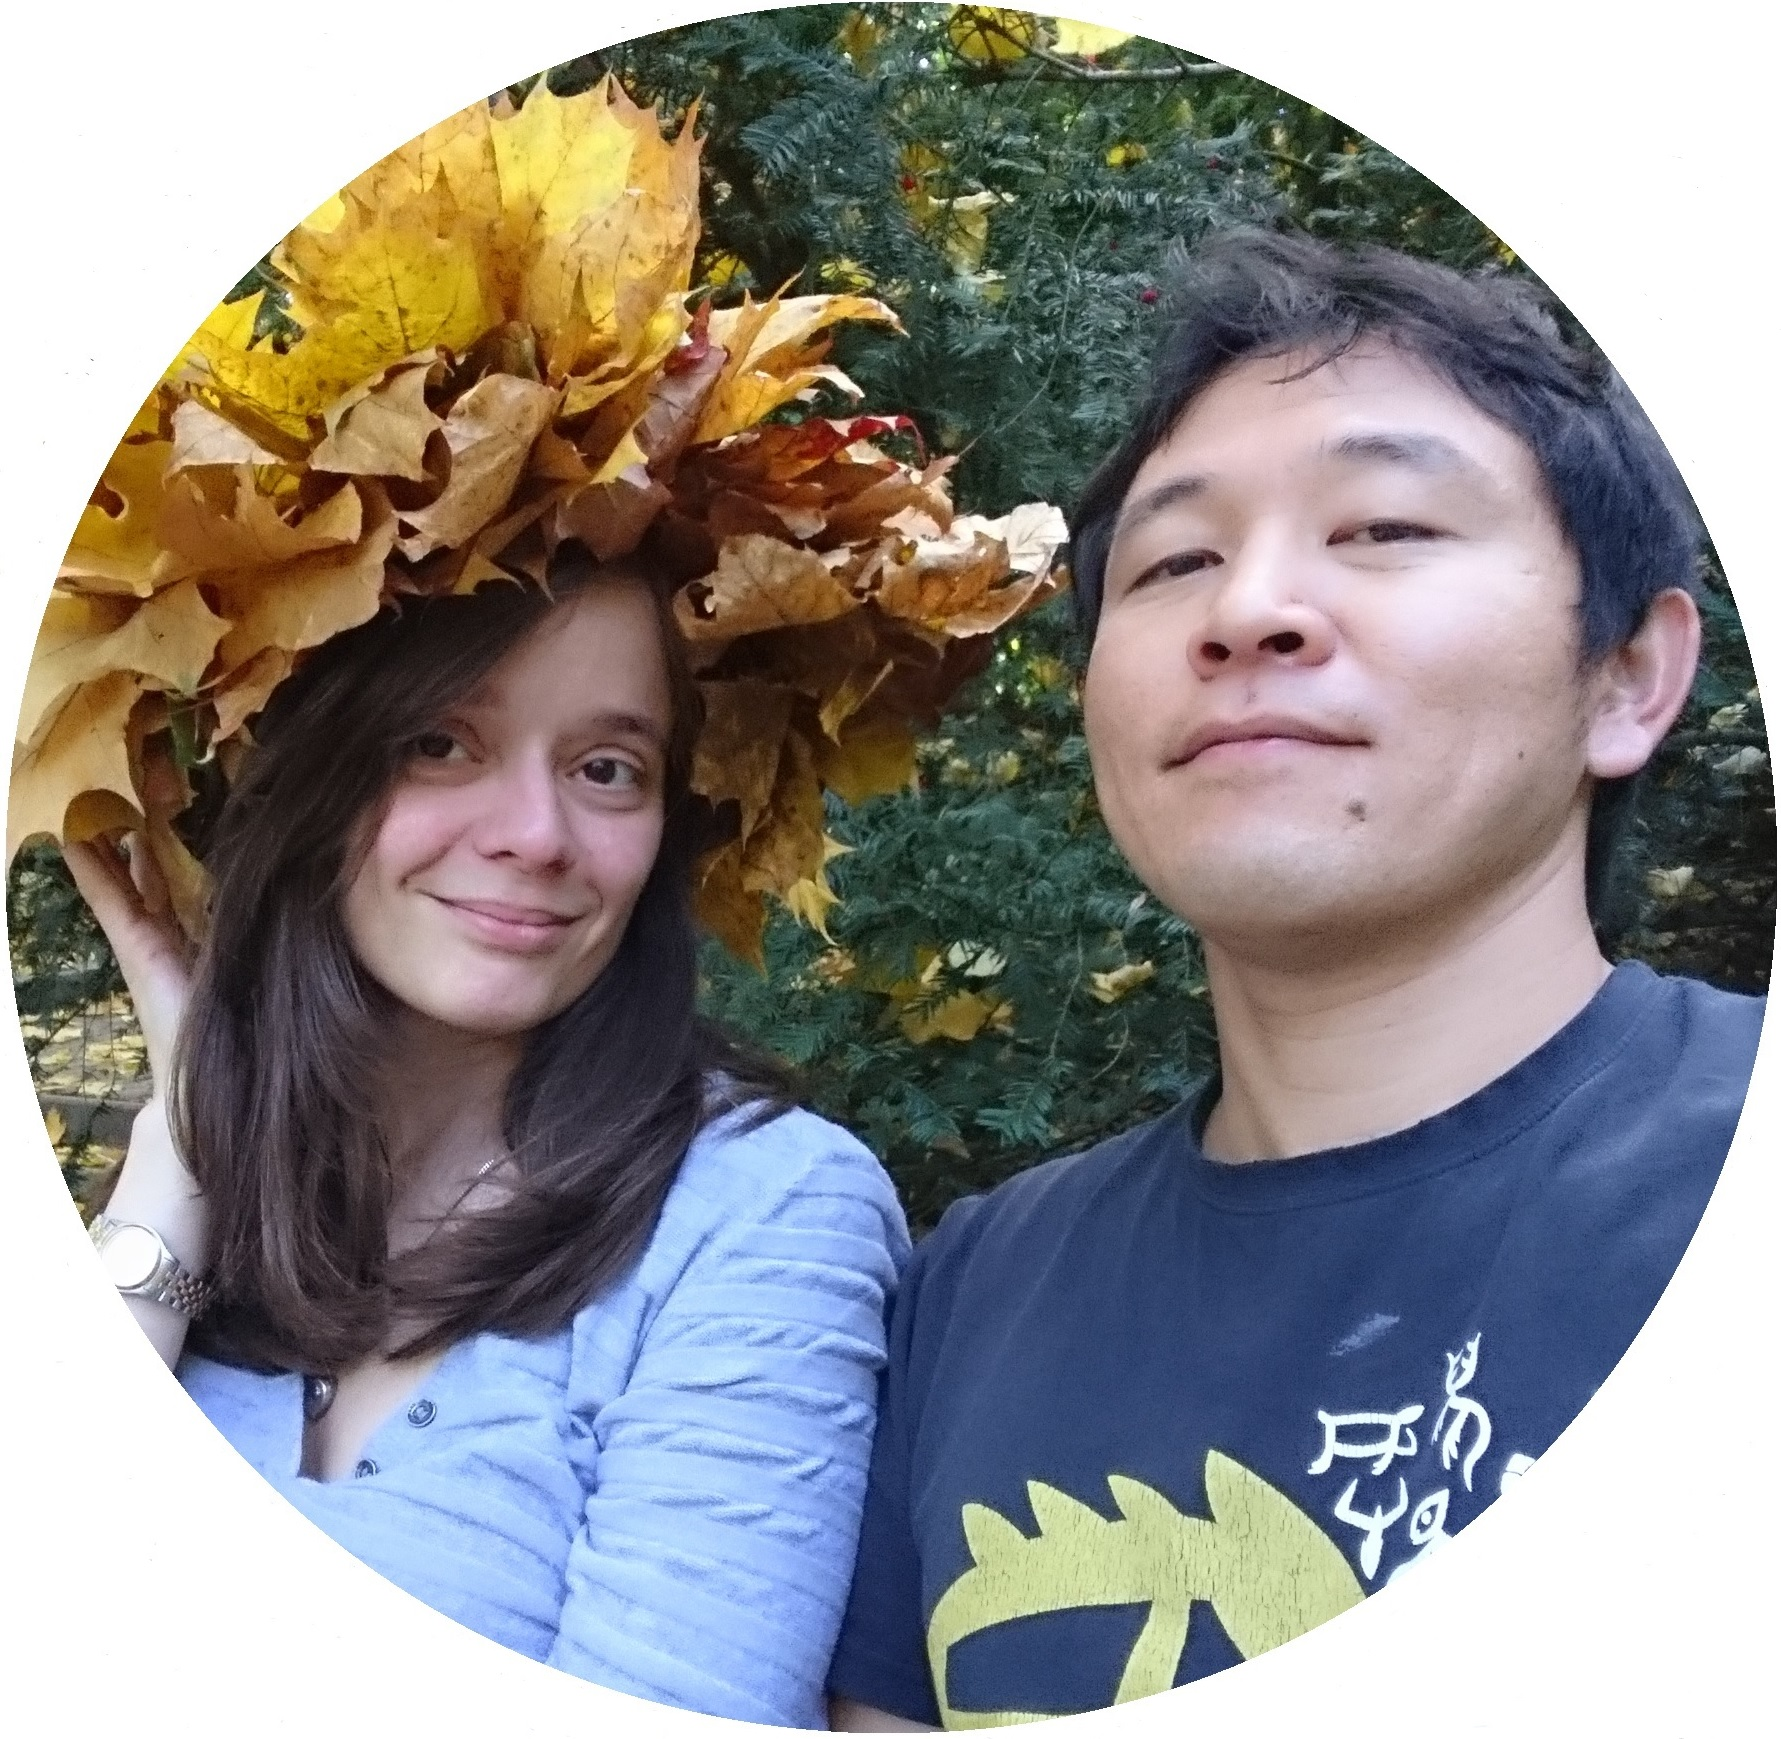 Laura-Tetsuya.com